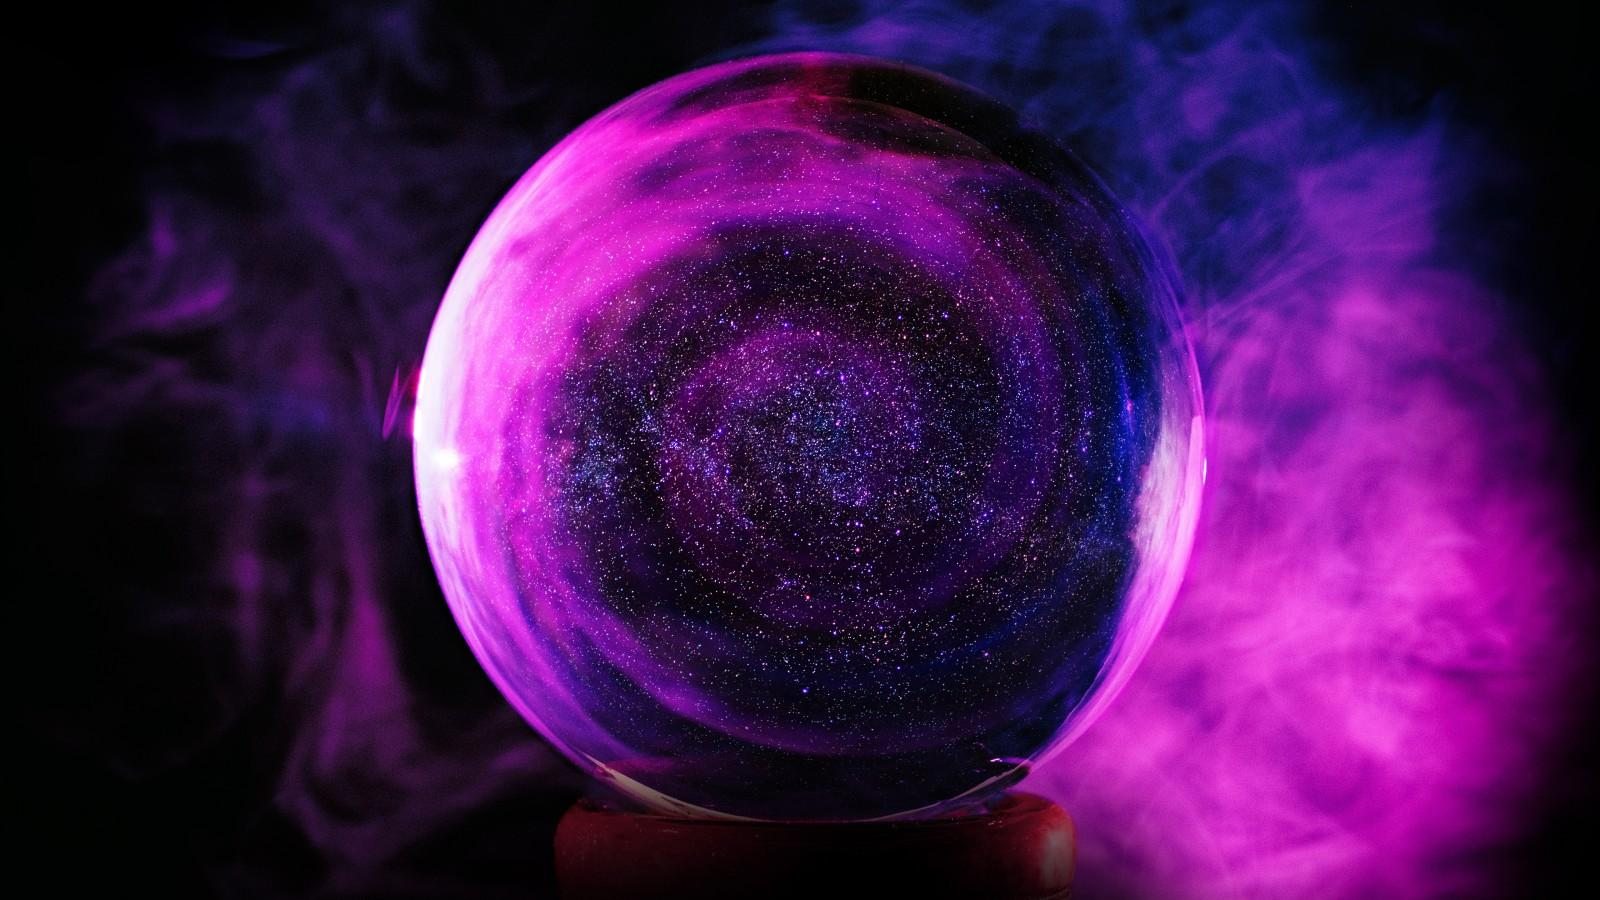 Smoke Wallpaper Iphone X Crystal Ball Purple Smoke 5k Wallpapers Hd Wallpapers